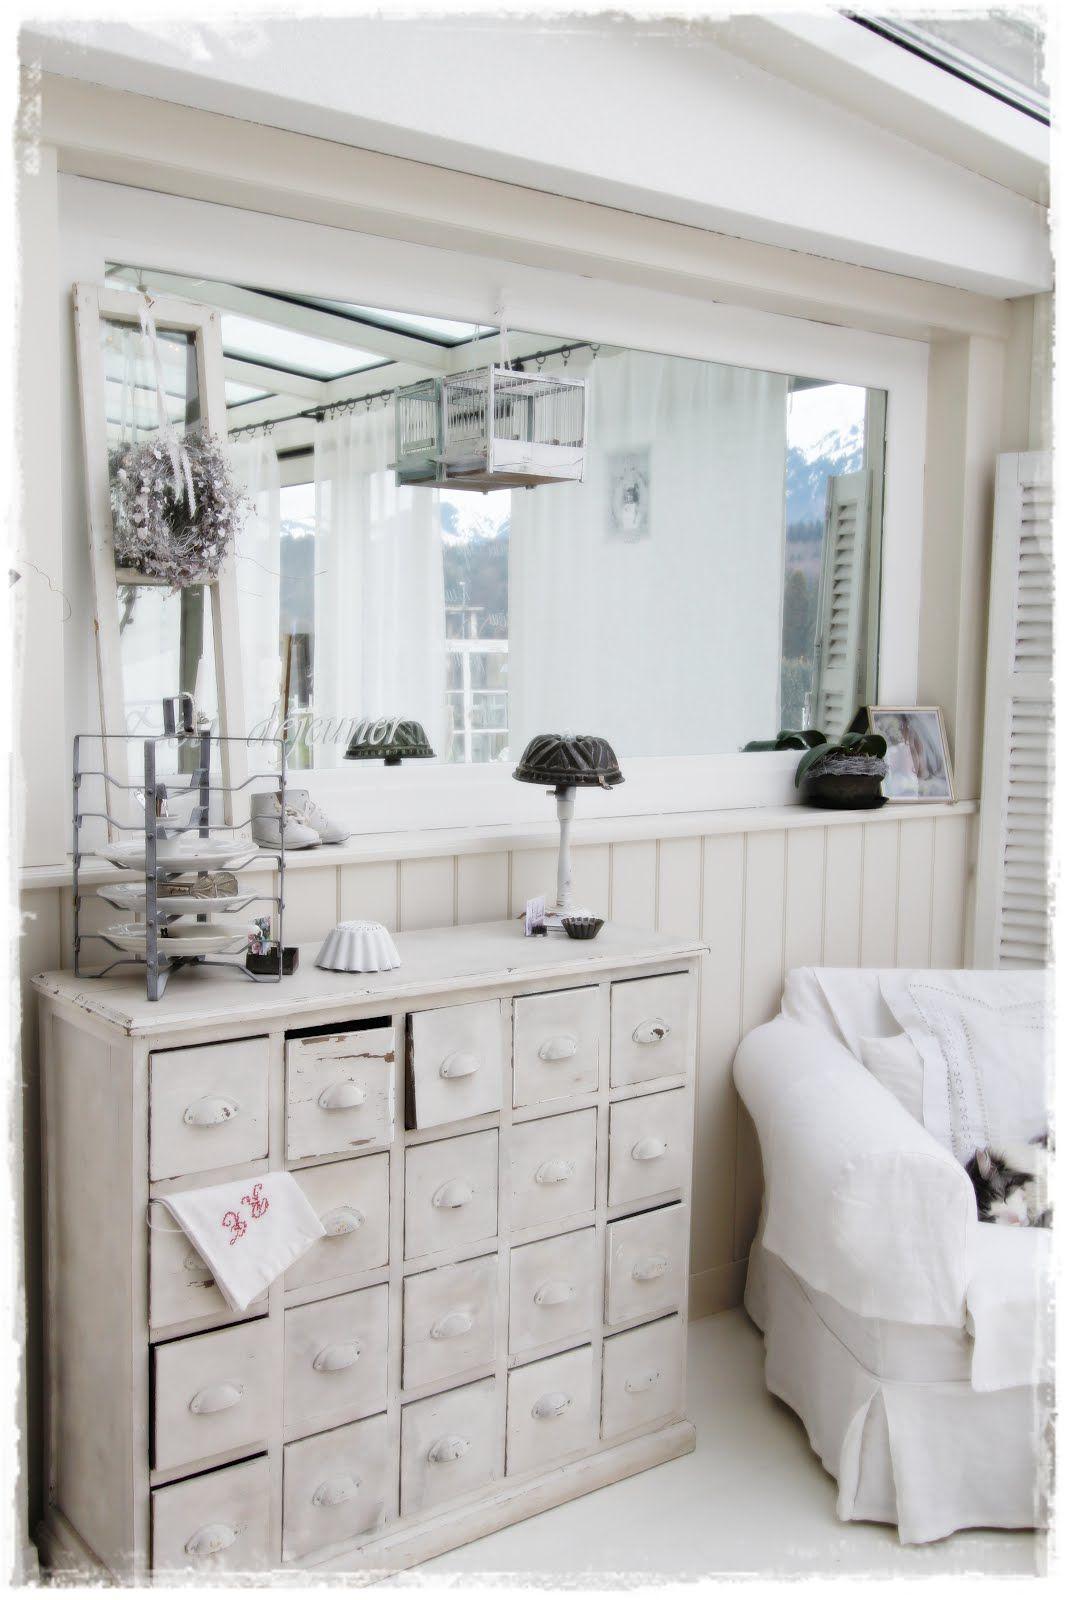 shabby chic kitchen decor cabinets st petersburg medicine cabinet living room white grey black chippy